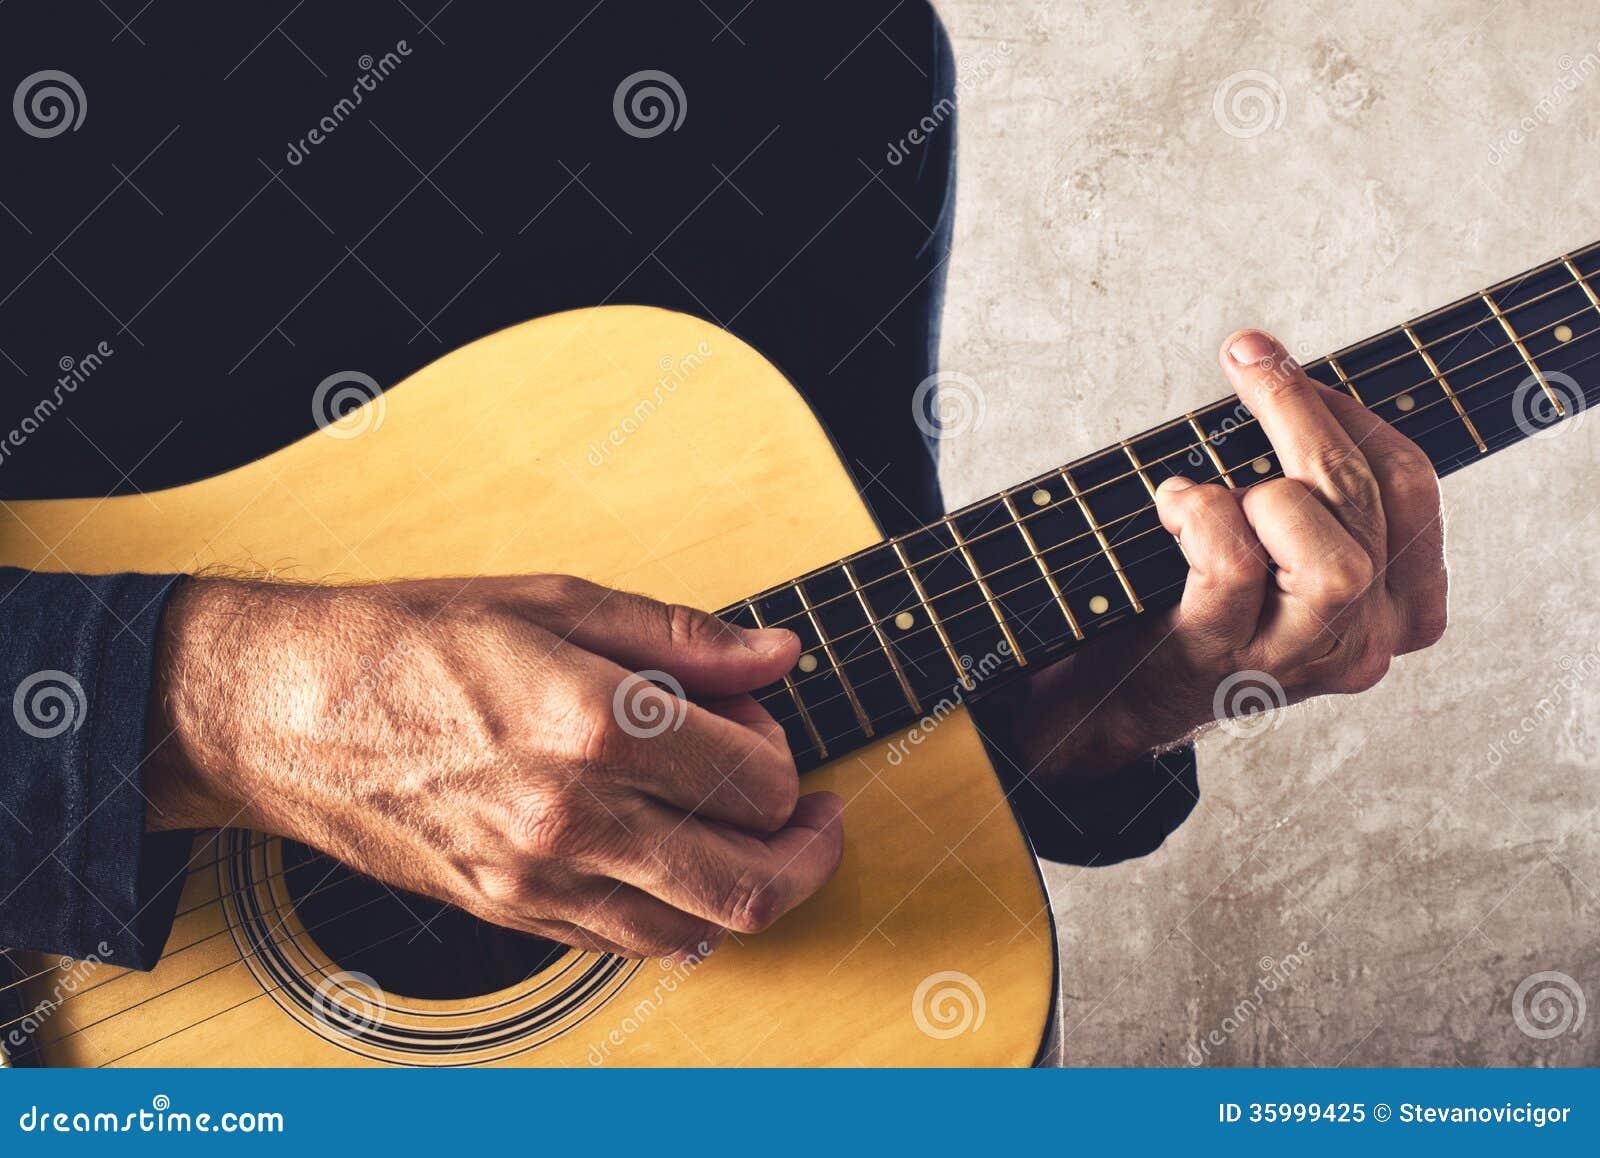 Guitar playing dude fucks a hot country girl 5